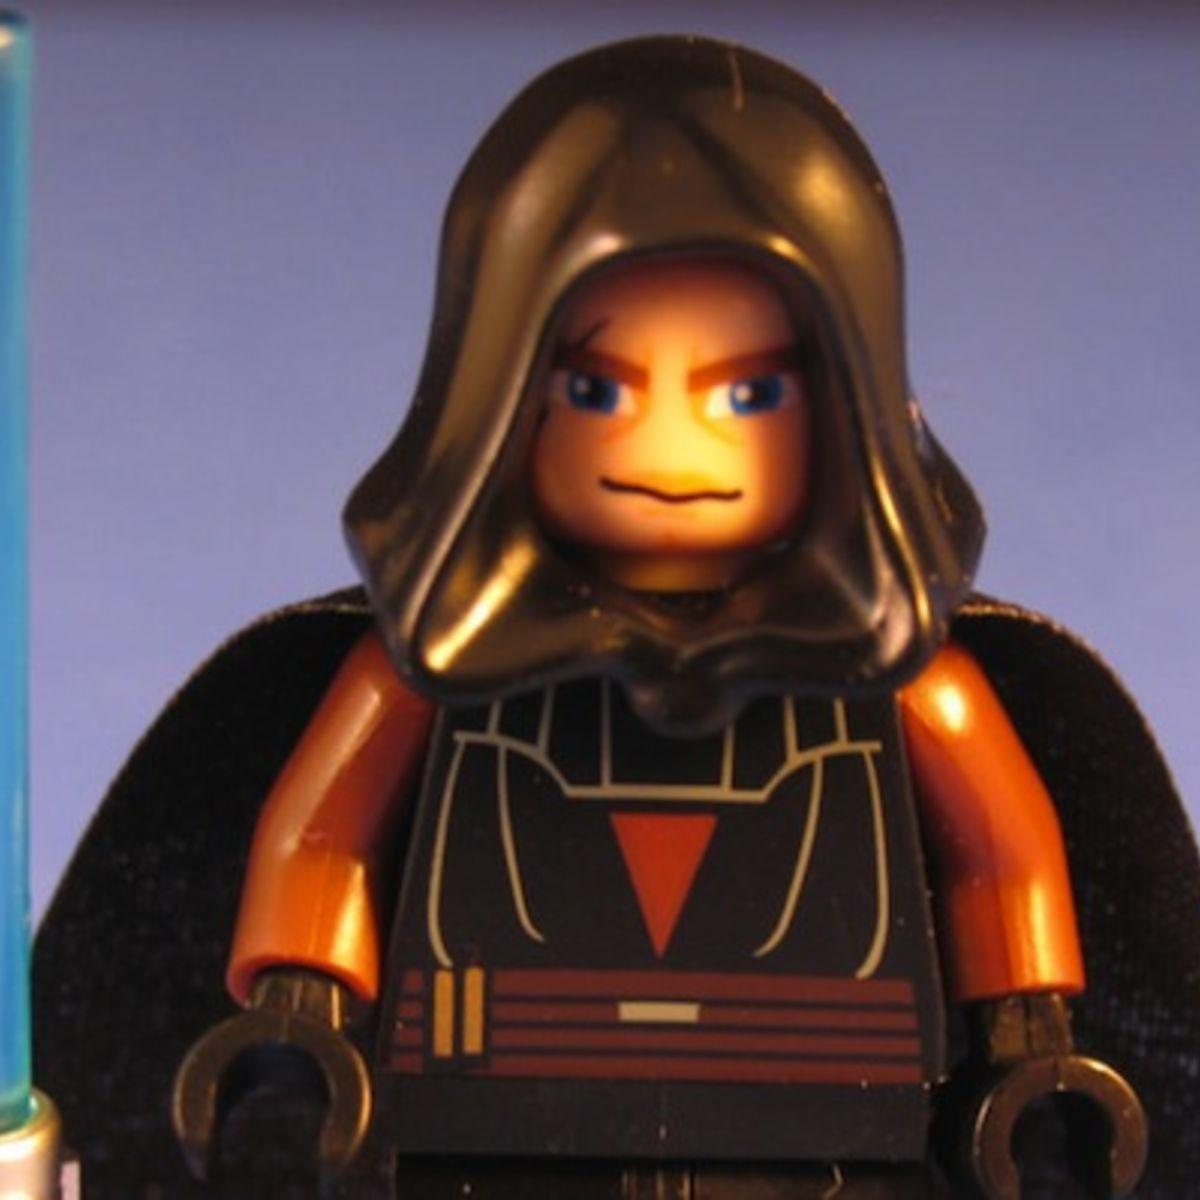 lego-anakin-skywalker.jpg